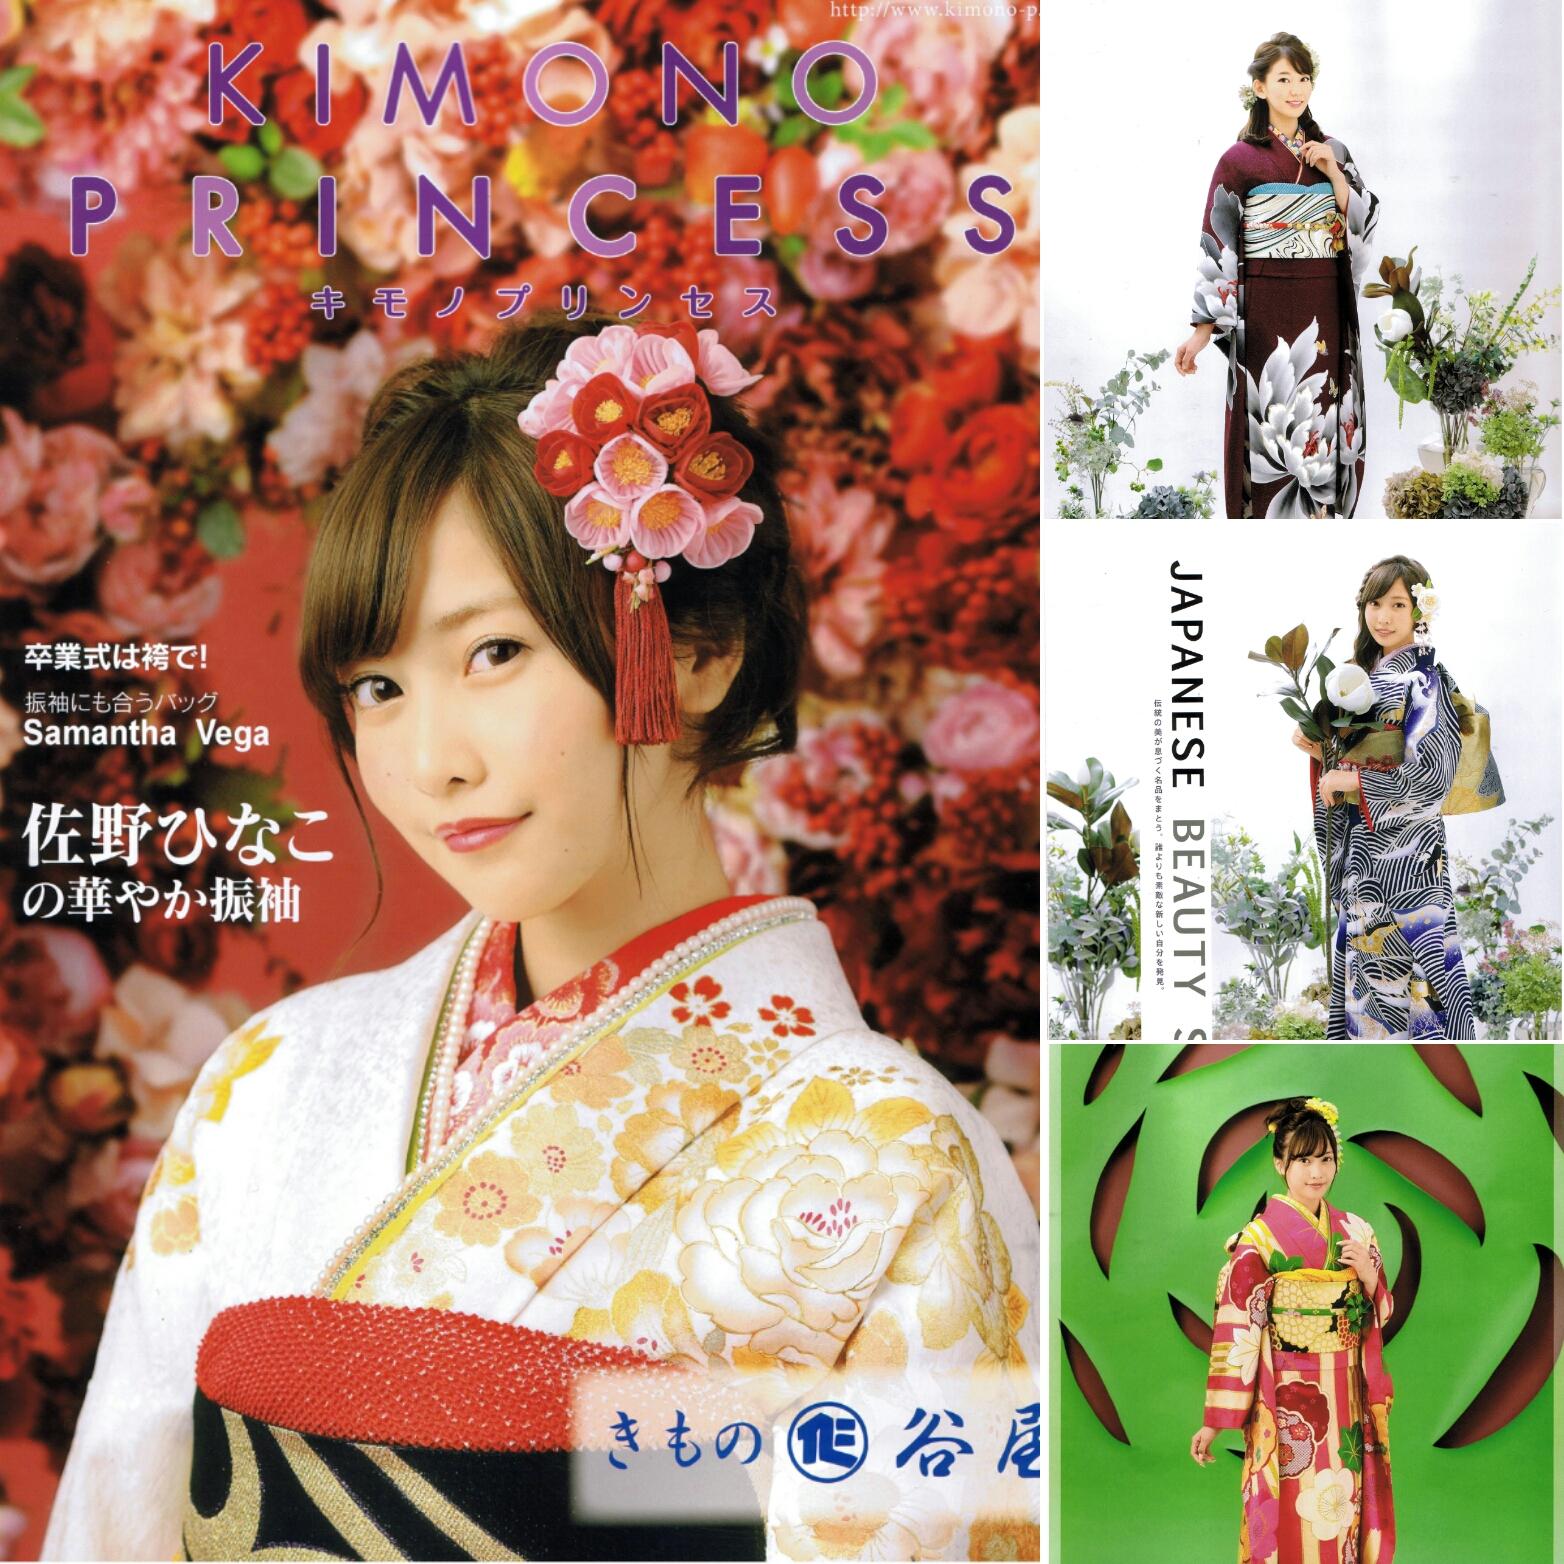 kimonopurinnsesu01.jpg